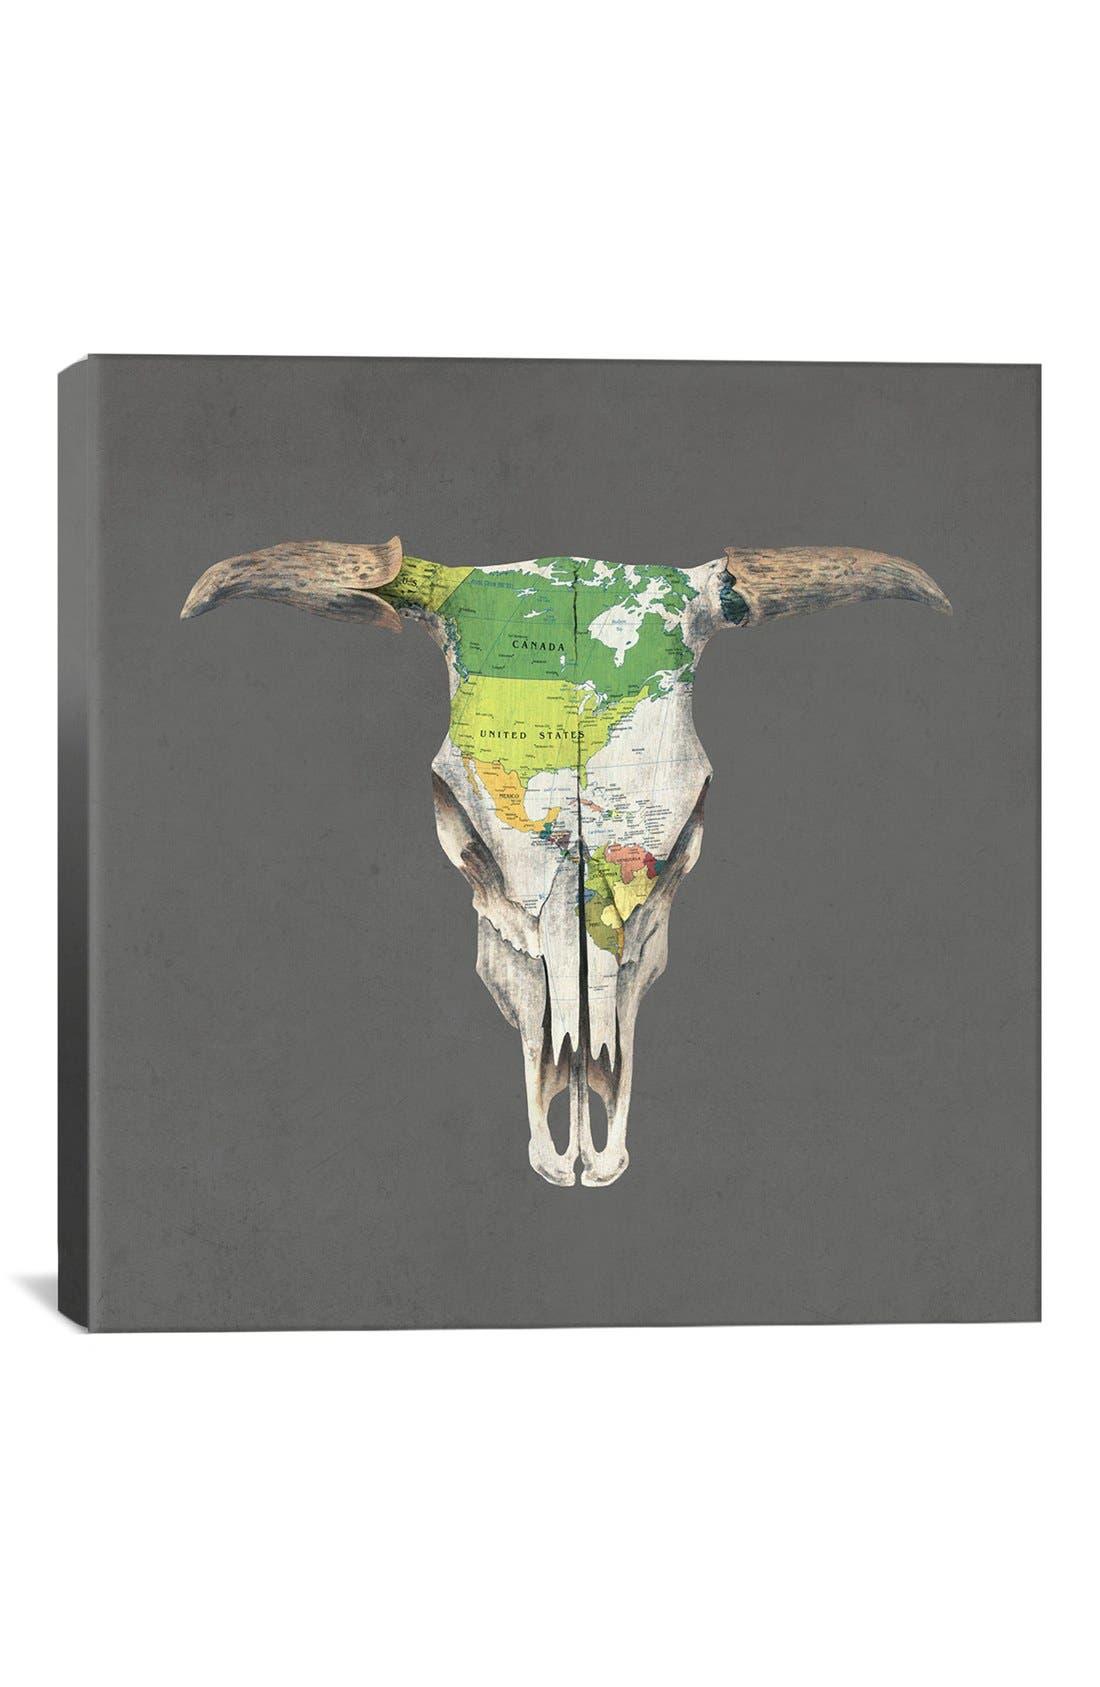 Alternate Image 1 Selected - iCanvas 'Go West - Terry Fan' Giclée Print Canvas Art